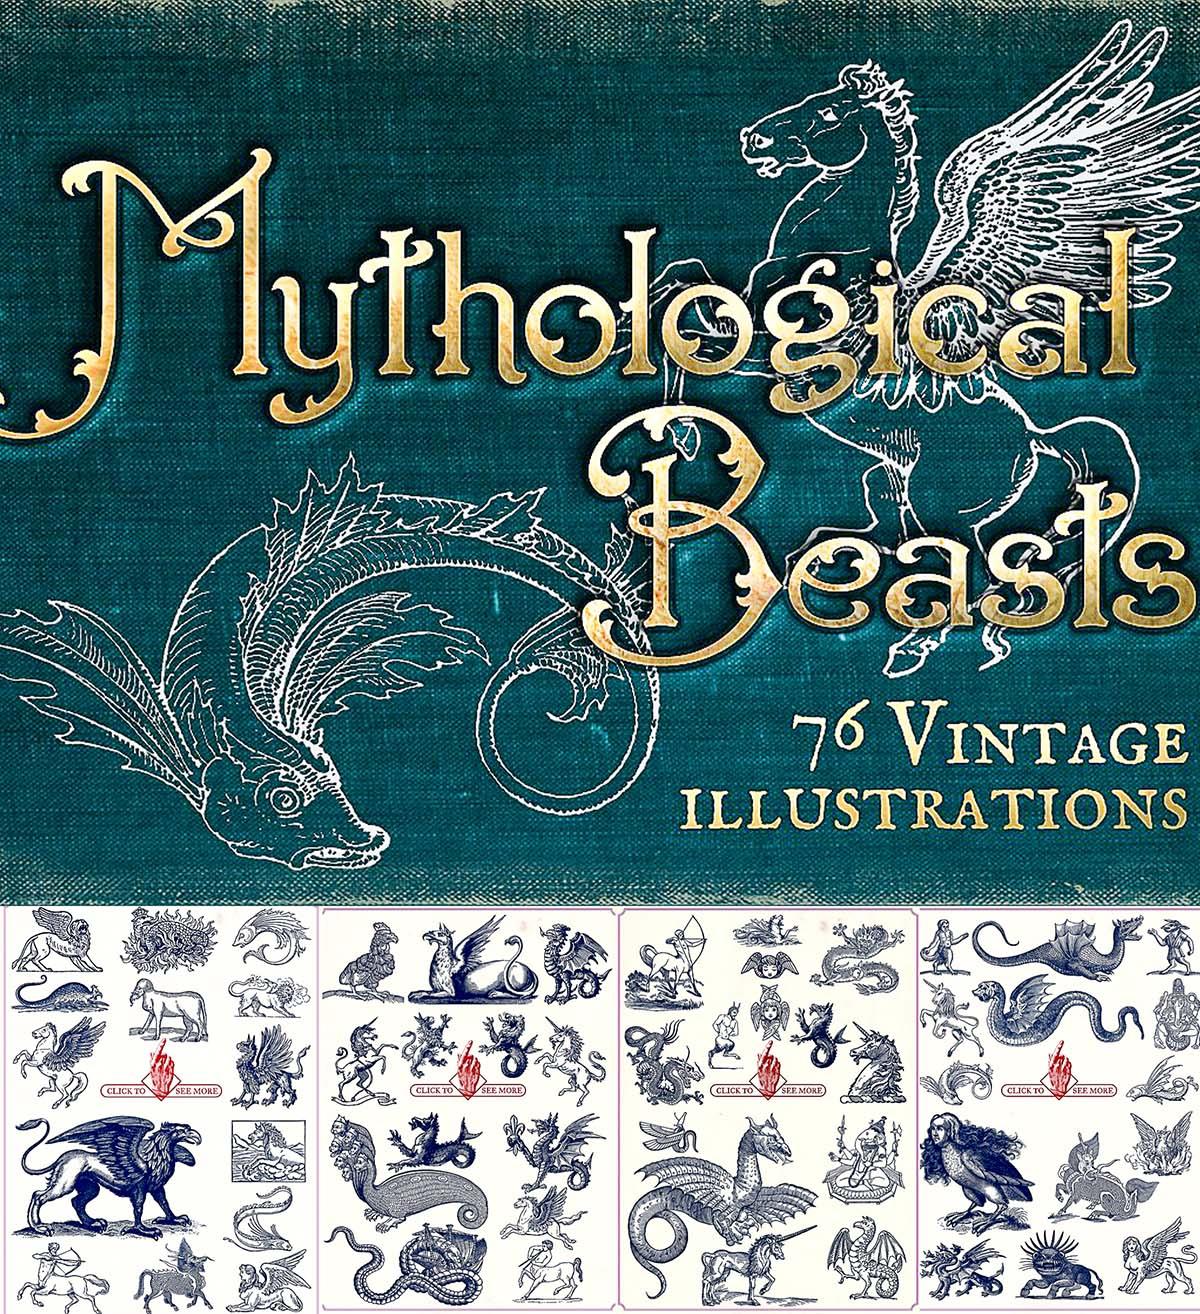 Vintage mythological beasts illustrations